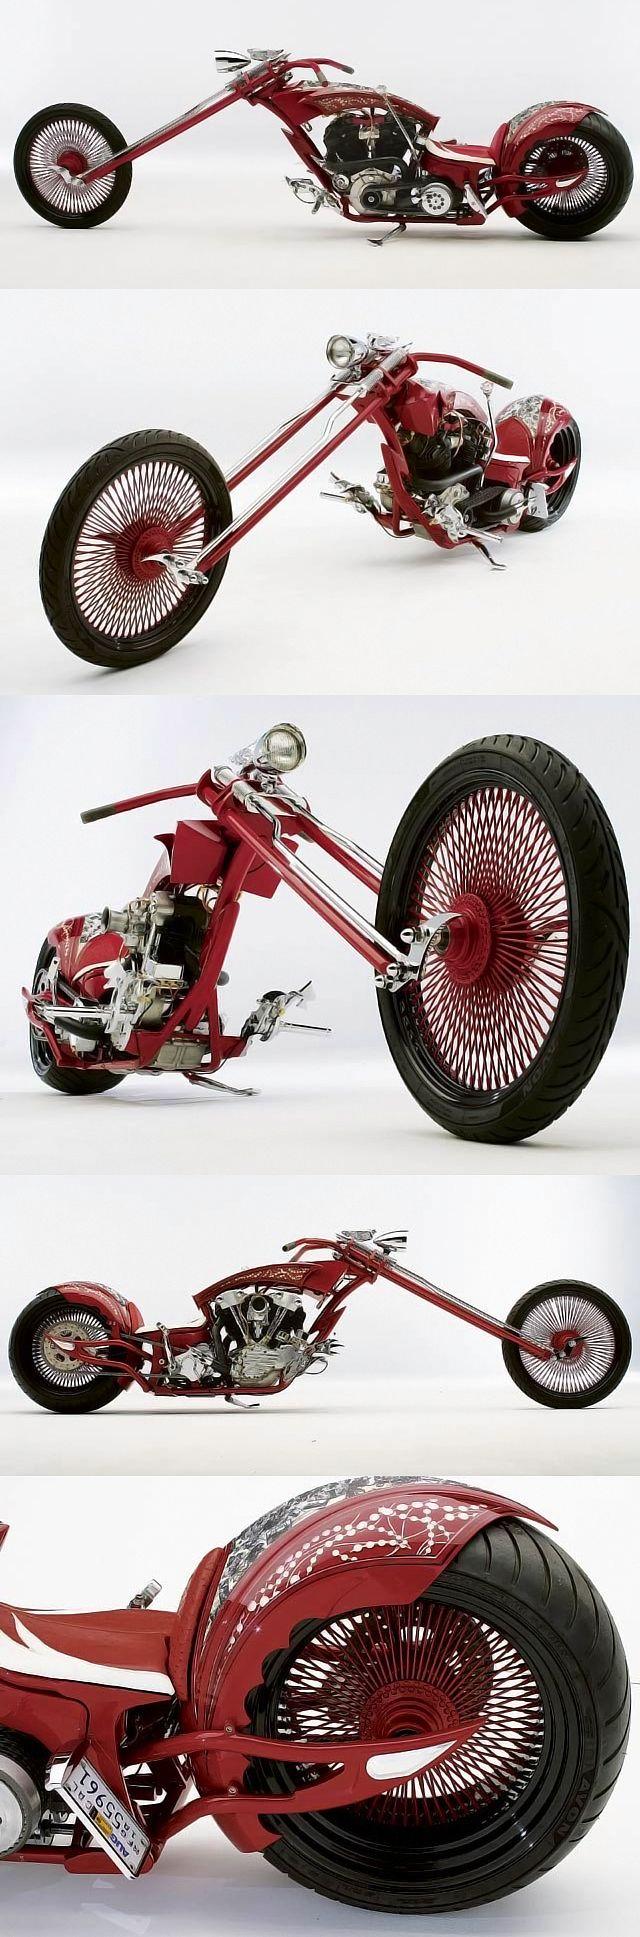 that, is pretty sweet... >>> Big Bear Choppers